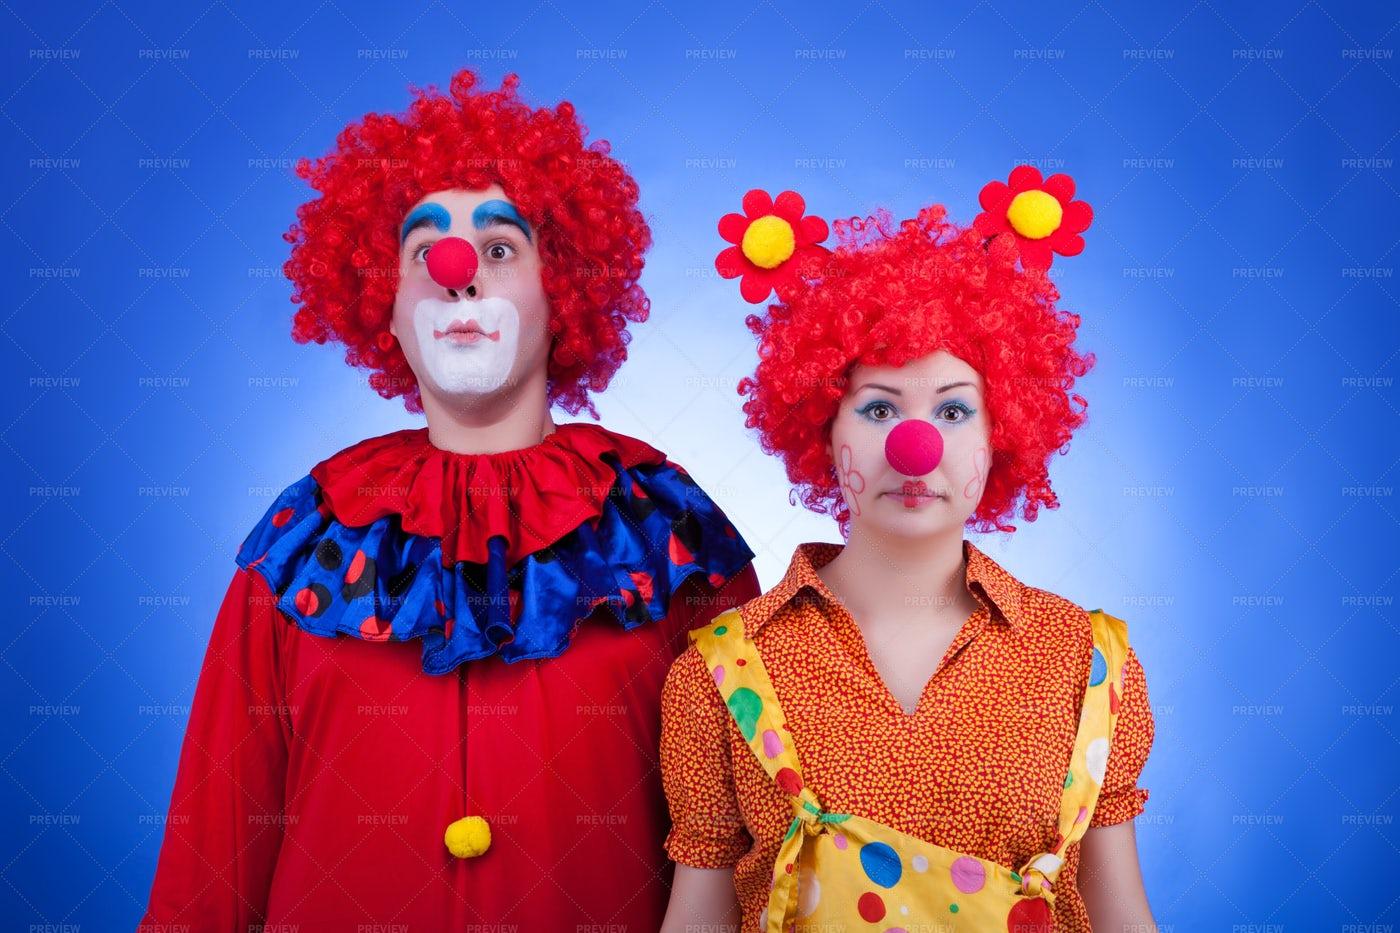 Clown Couple On Blue Background: Stock Photos